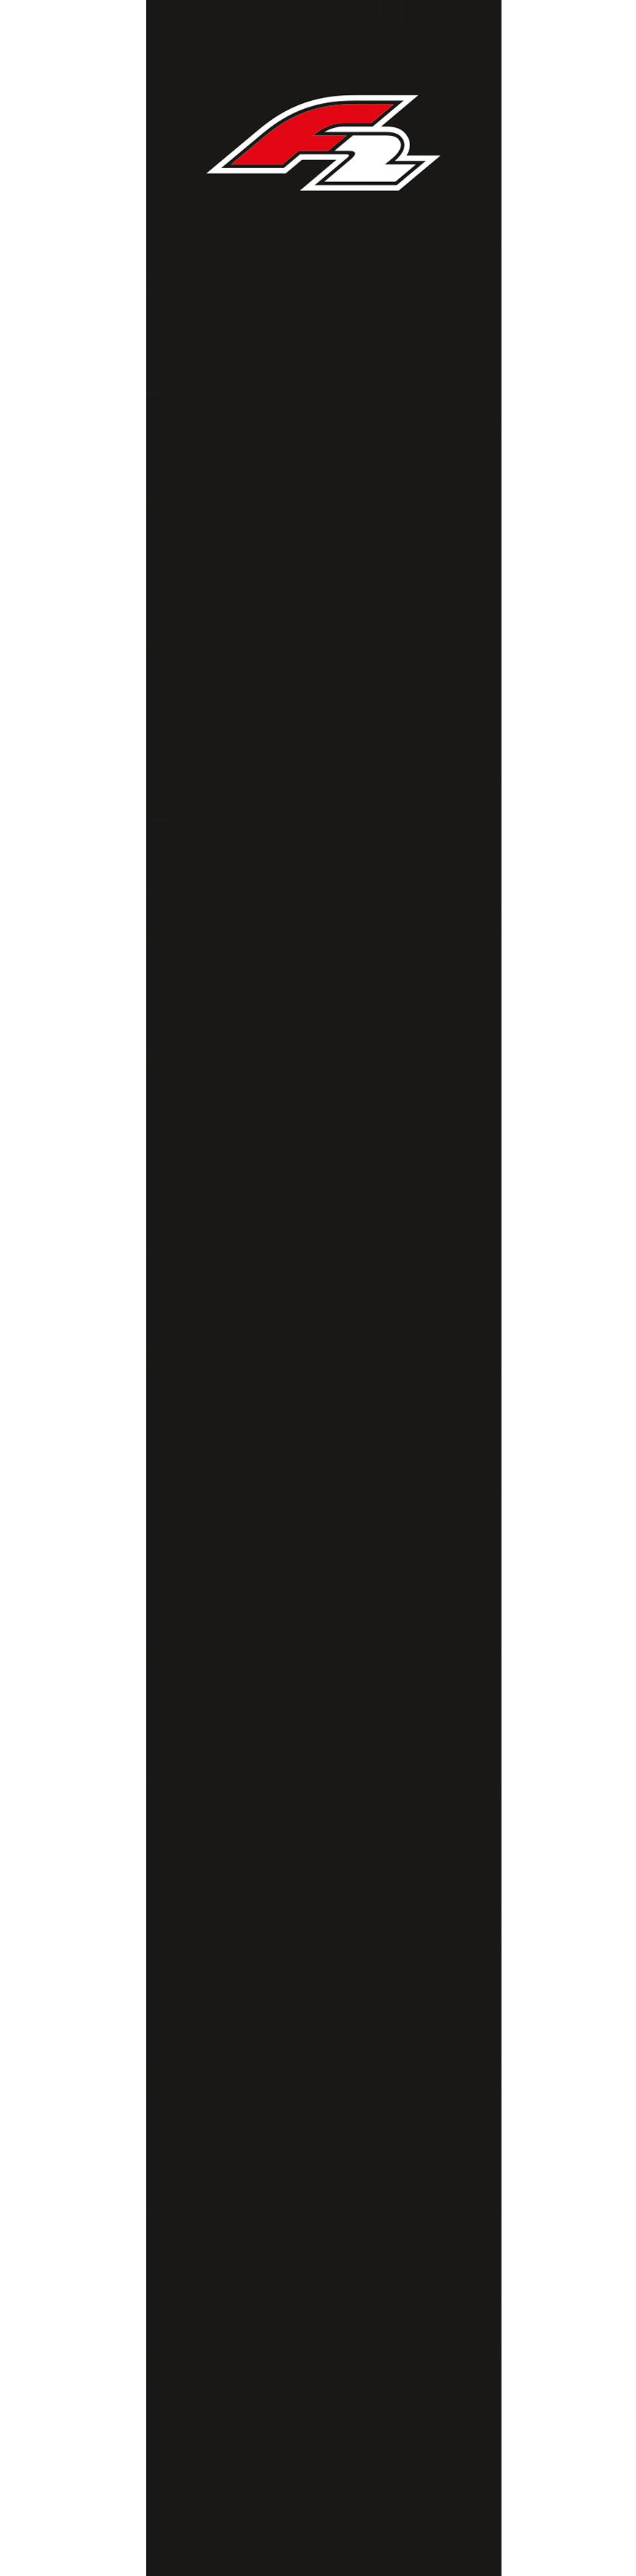 SILBERPFEIL - Base